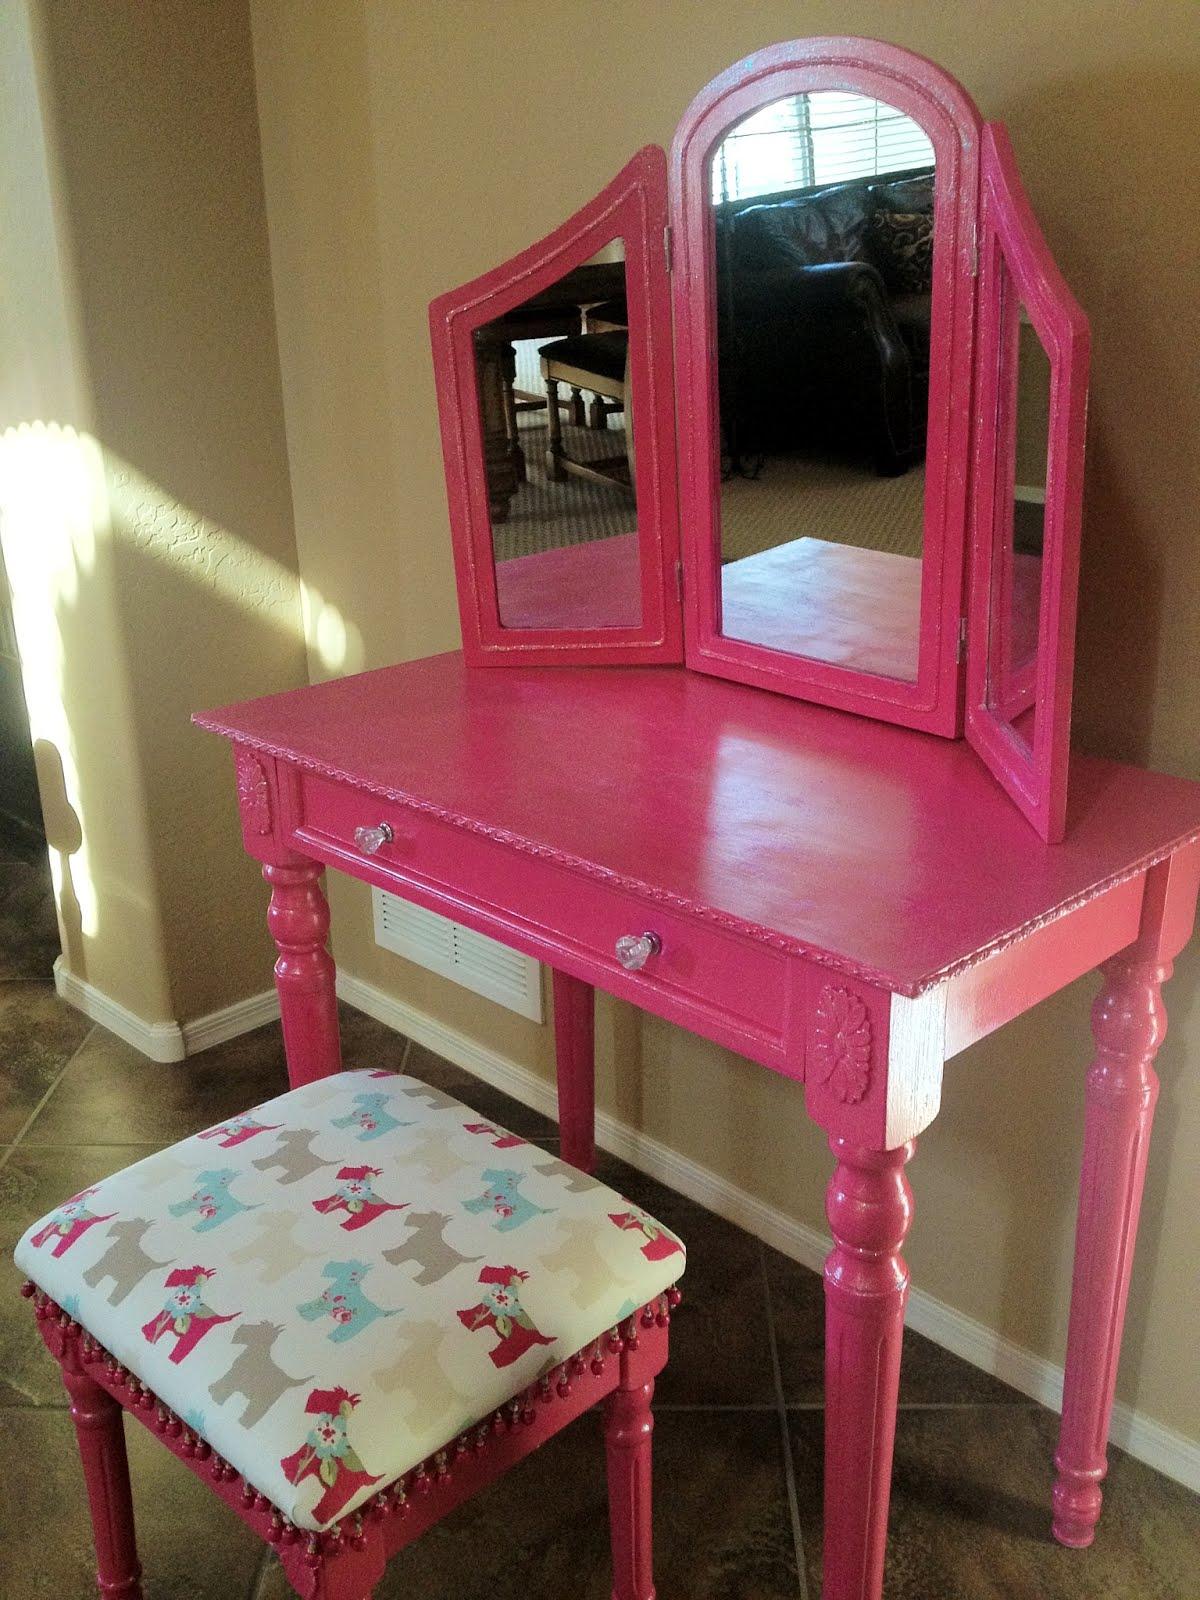 Purple Makeup Vanity Chair Stool Dream Meaning Susan Crabtree April 2012